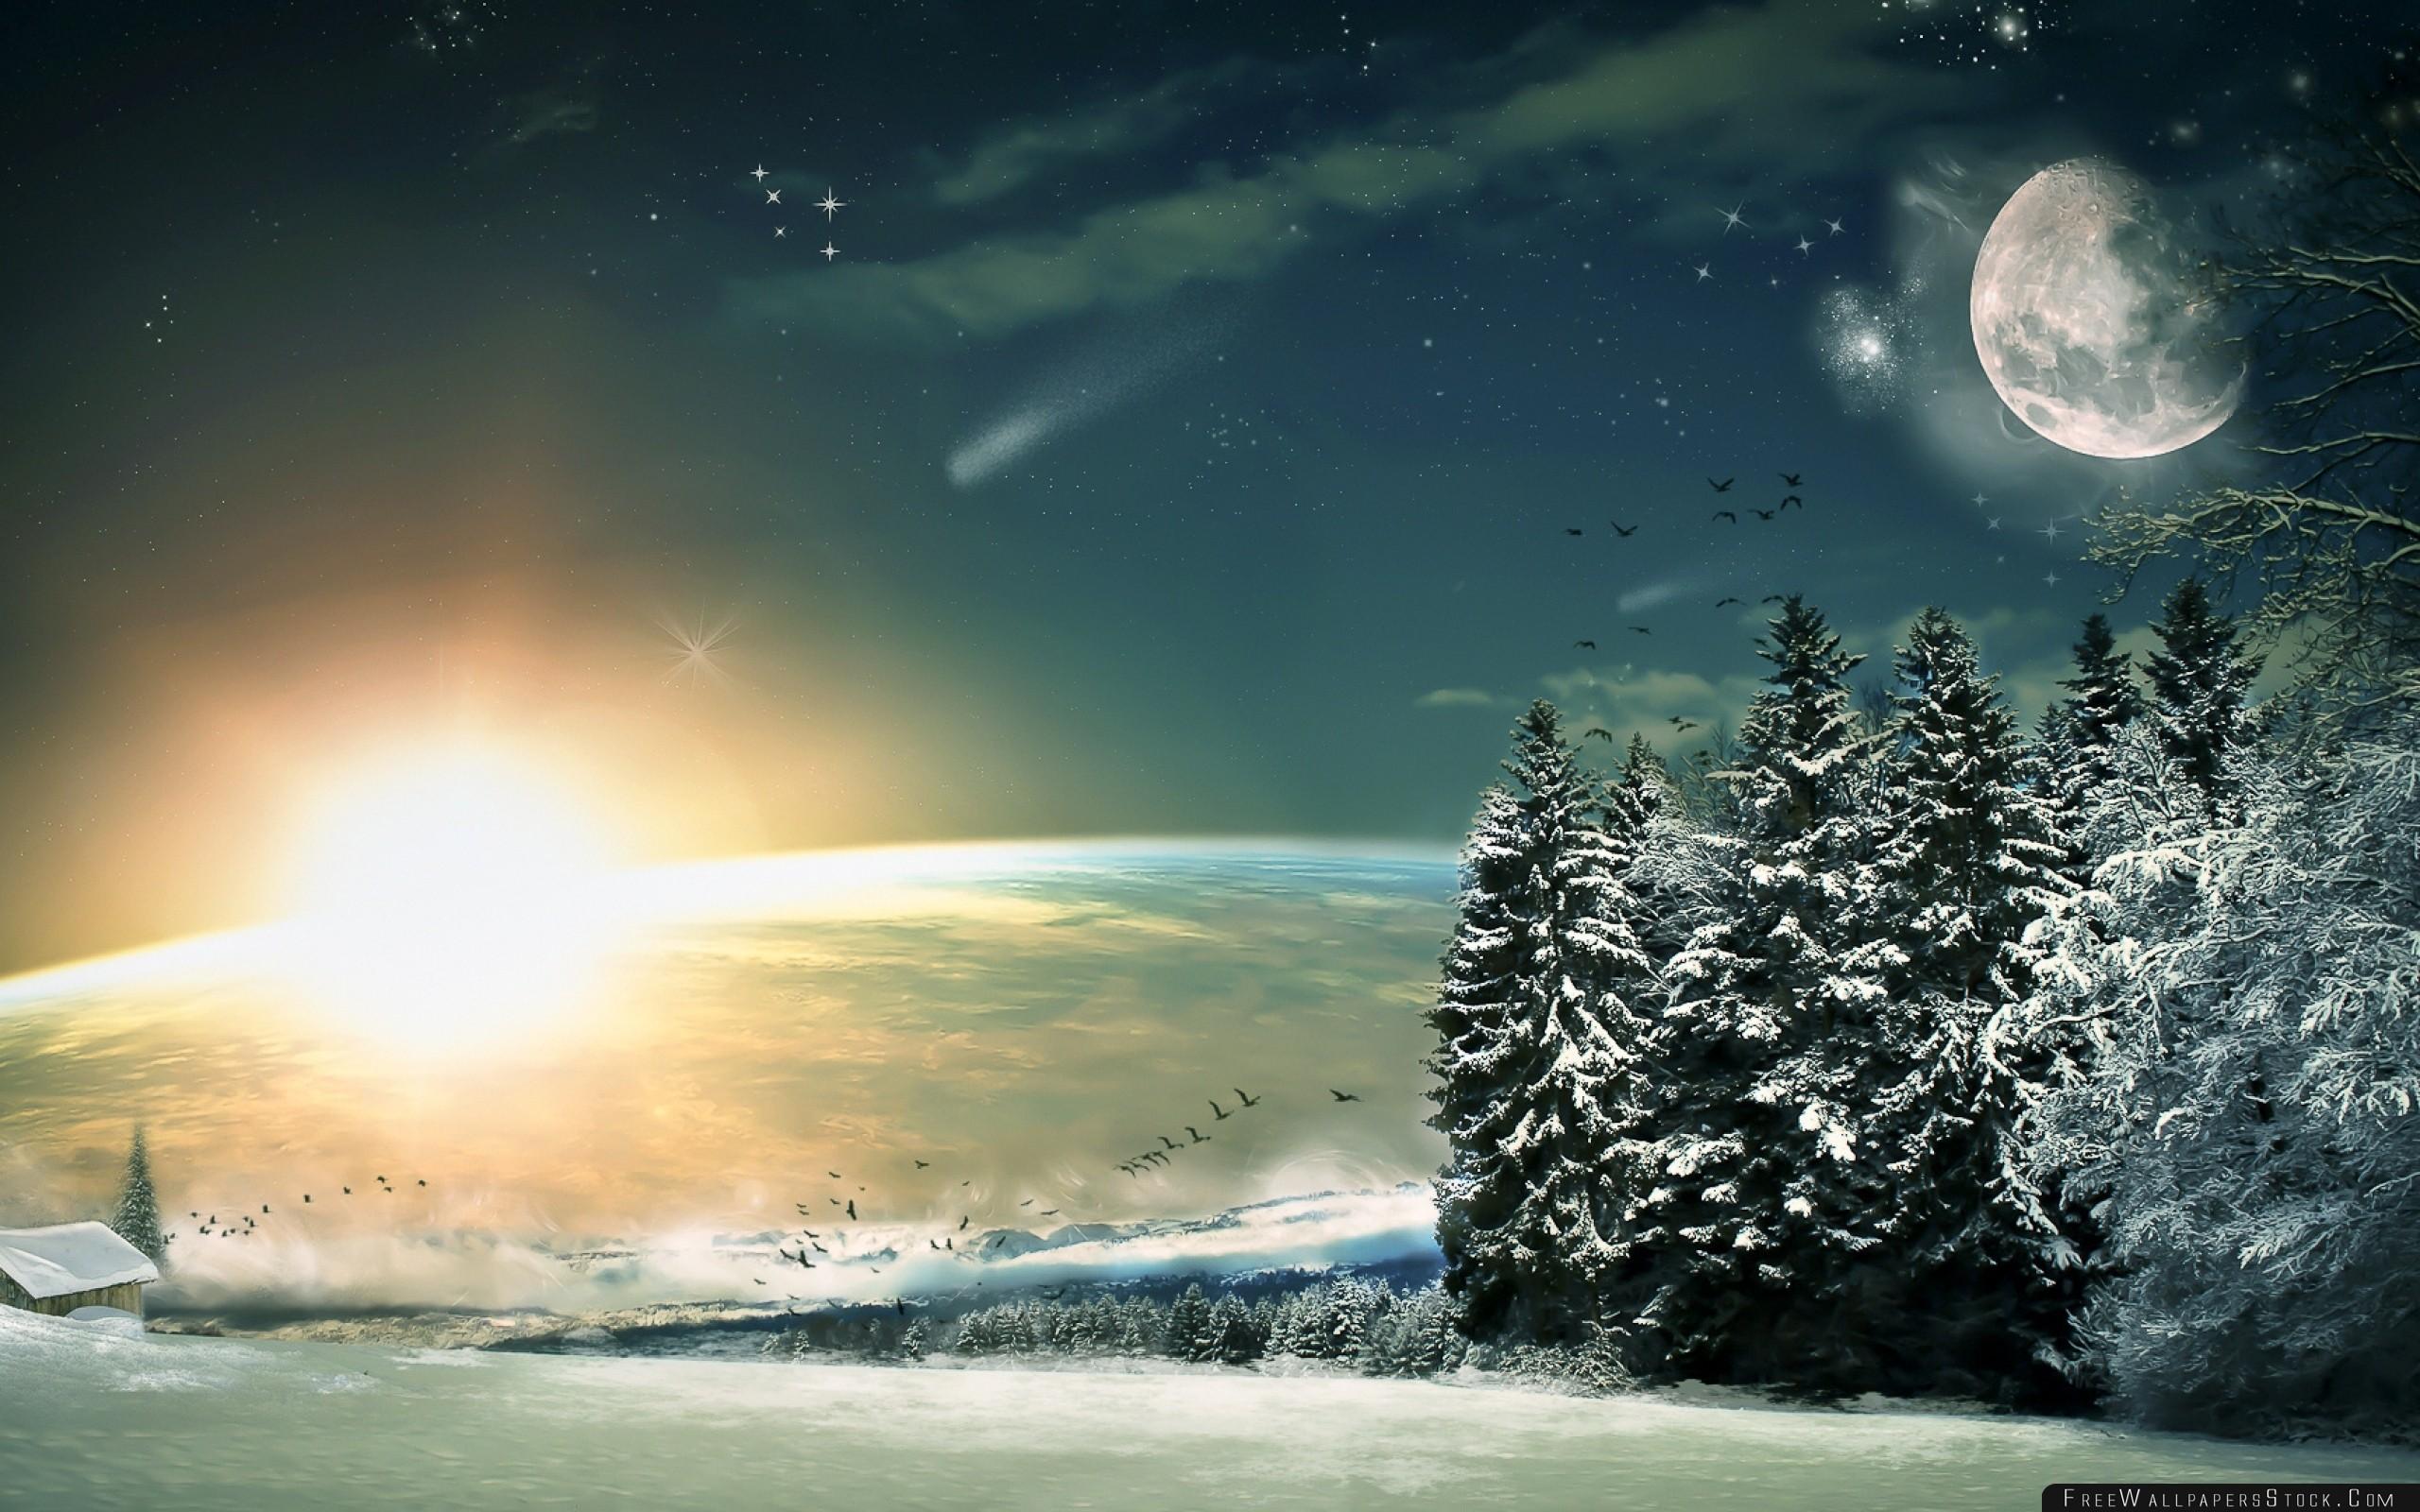 Download Free Wallpaper Moon Stars Night Fantasy Landscape Painting Art Wood Winter